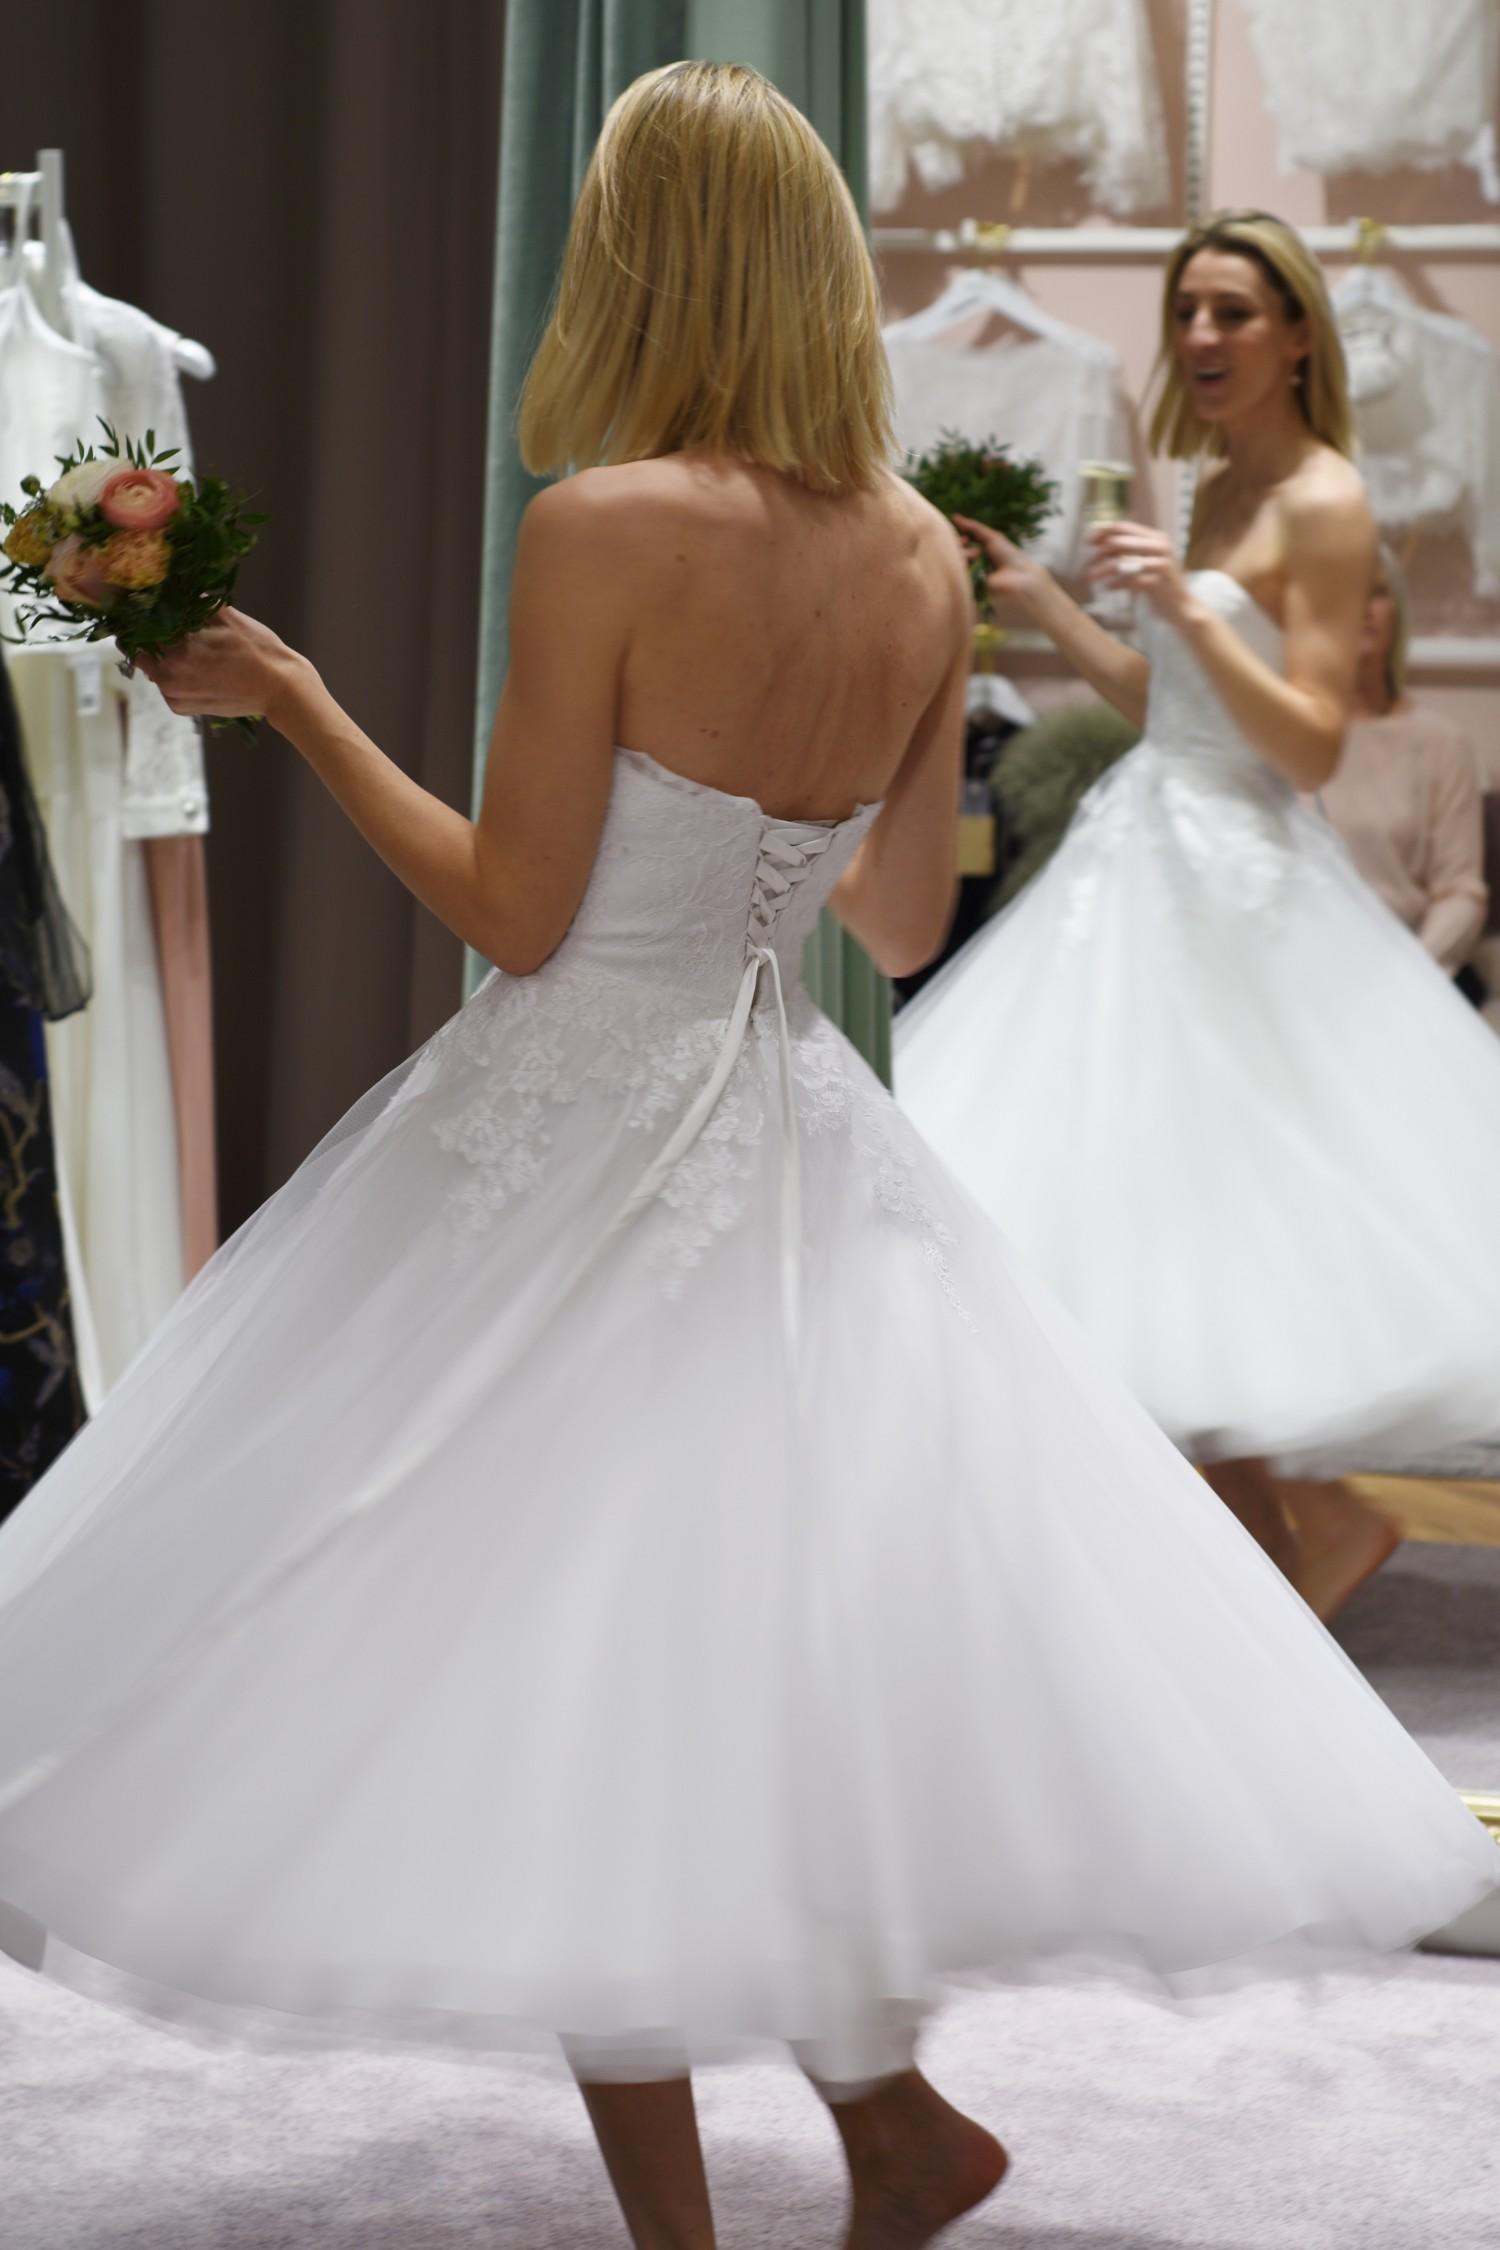 lilly-brudekjoler-annemette-voss-76